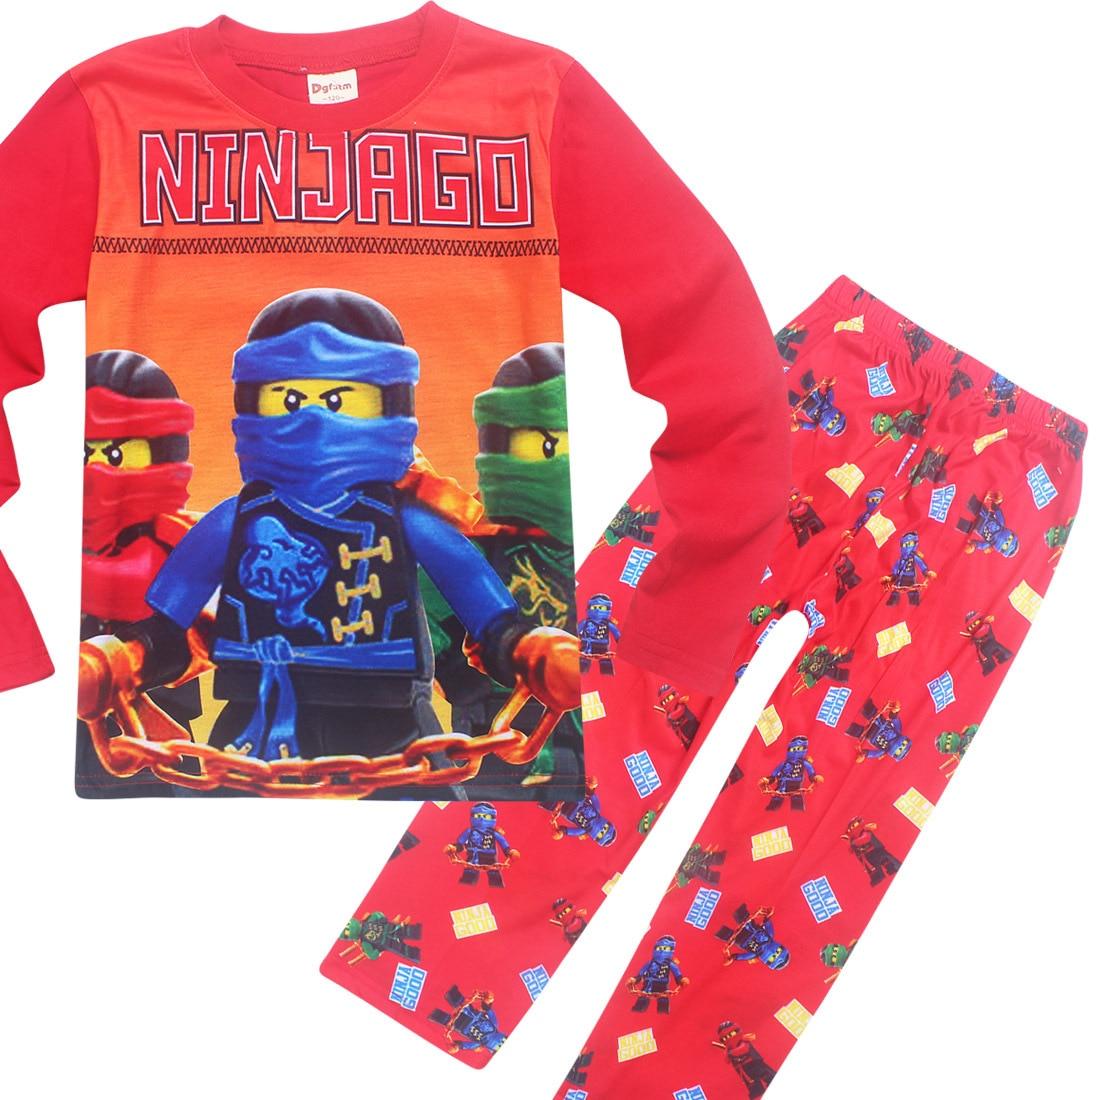 Bambin Kds garçon Ninjago vêtements de nuit Ninja Pyjamas de noël pour garçons bébé filles Pyjamas Halloween fête vêtements enfants Pijamas